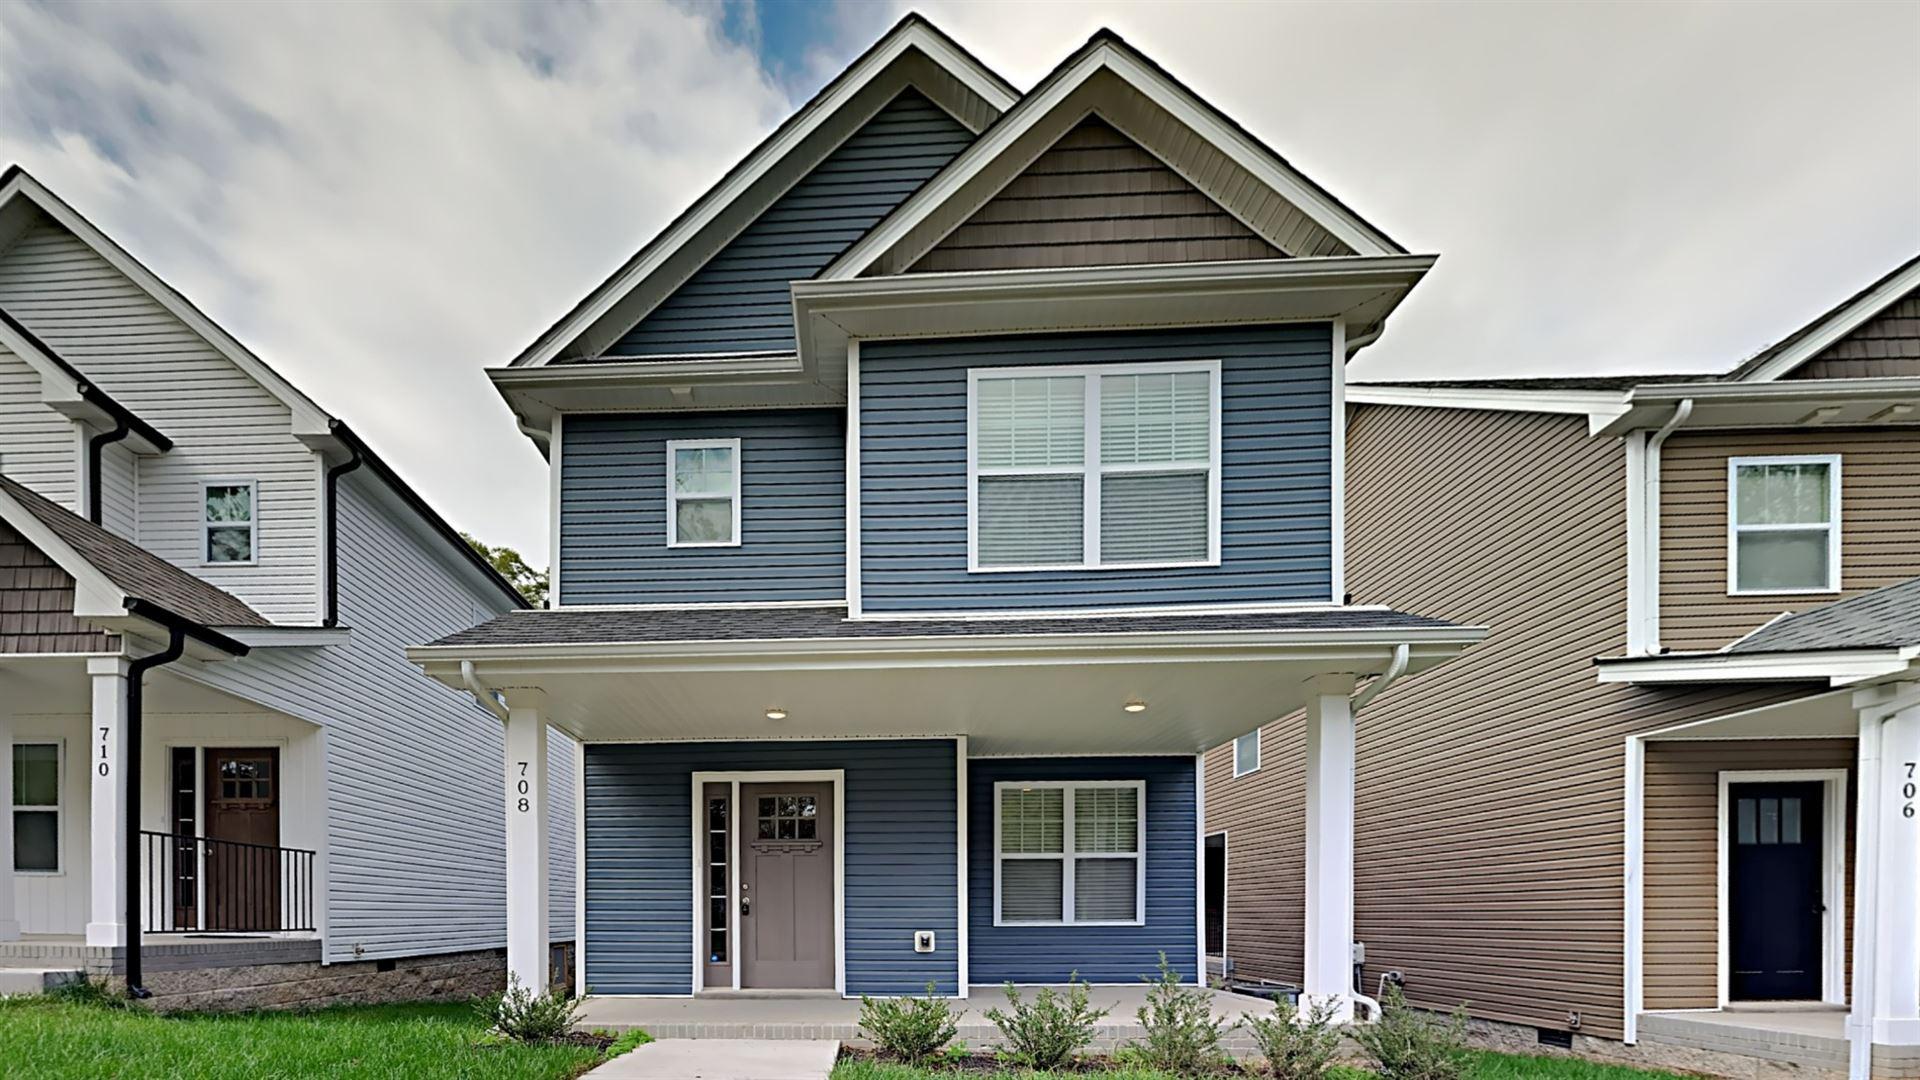 708 Perkins Ave, Clarksville, TN 37040 - MLS#: 2303270